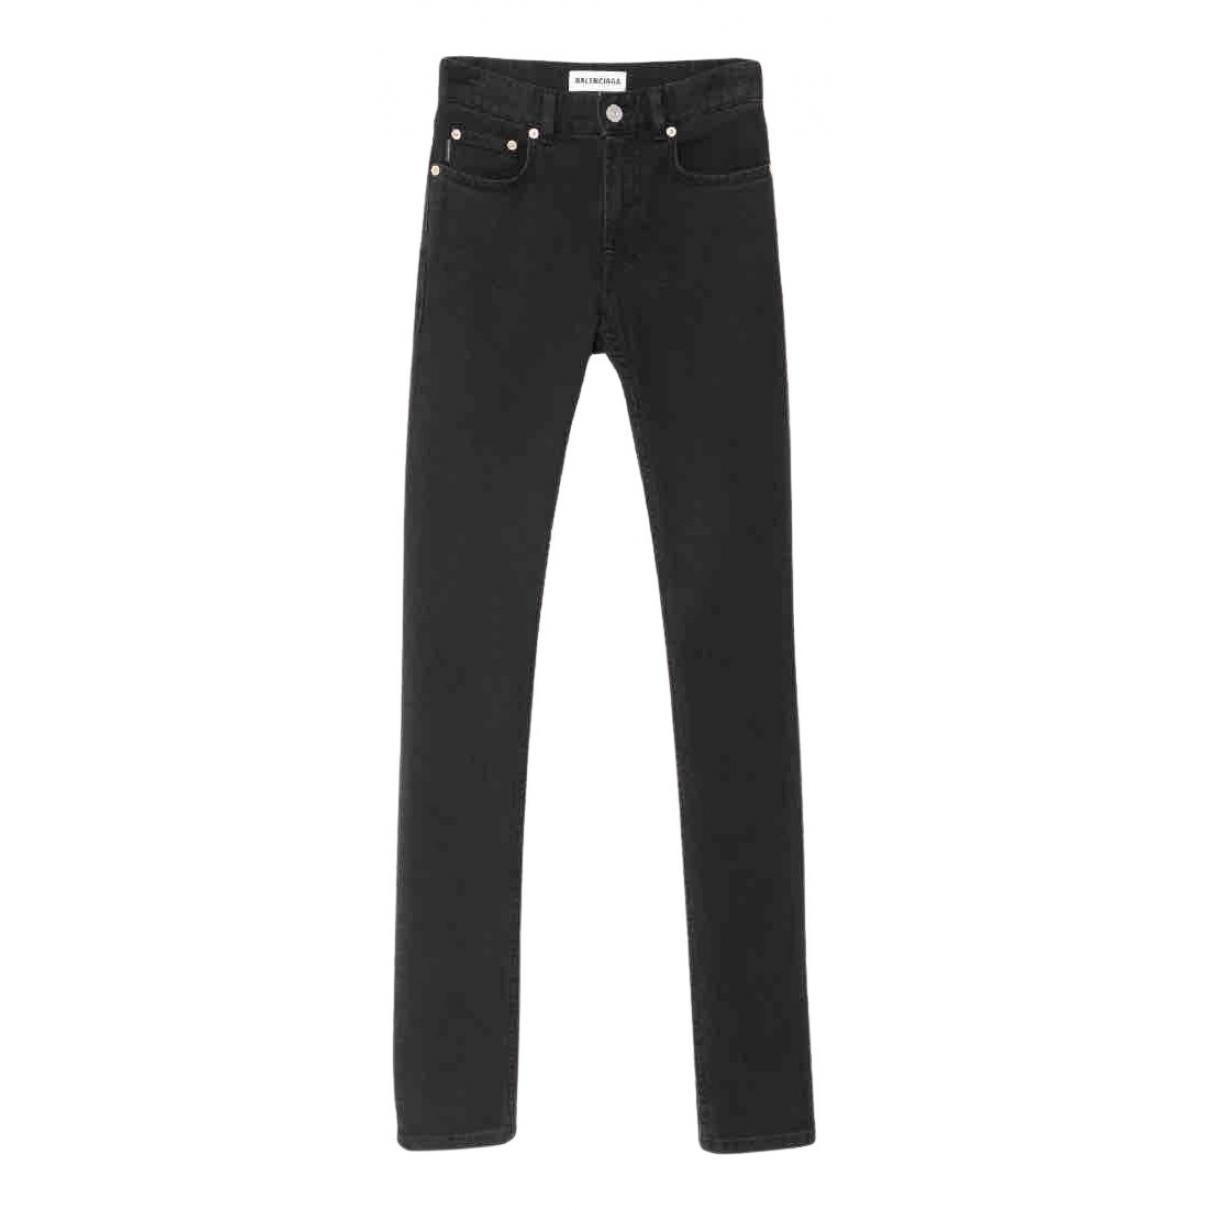 Balenciaga - Pantalon   pour femme en denim - noir